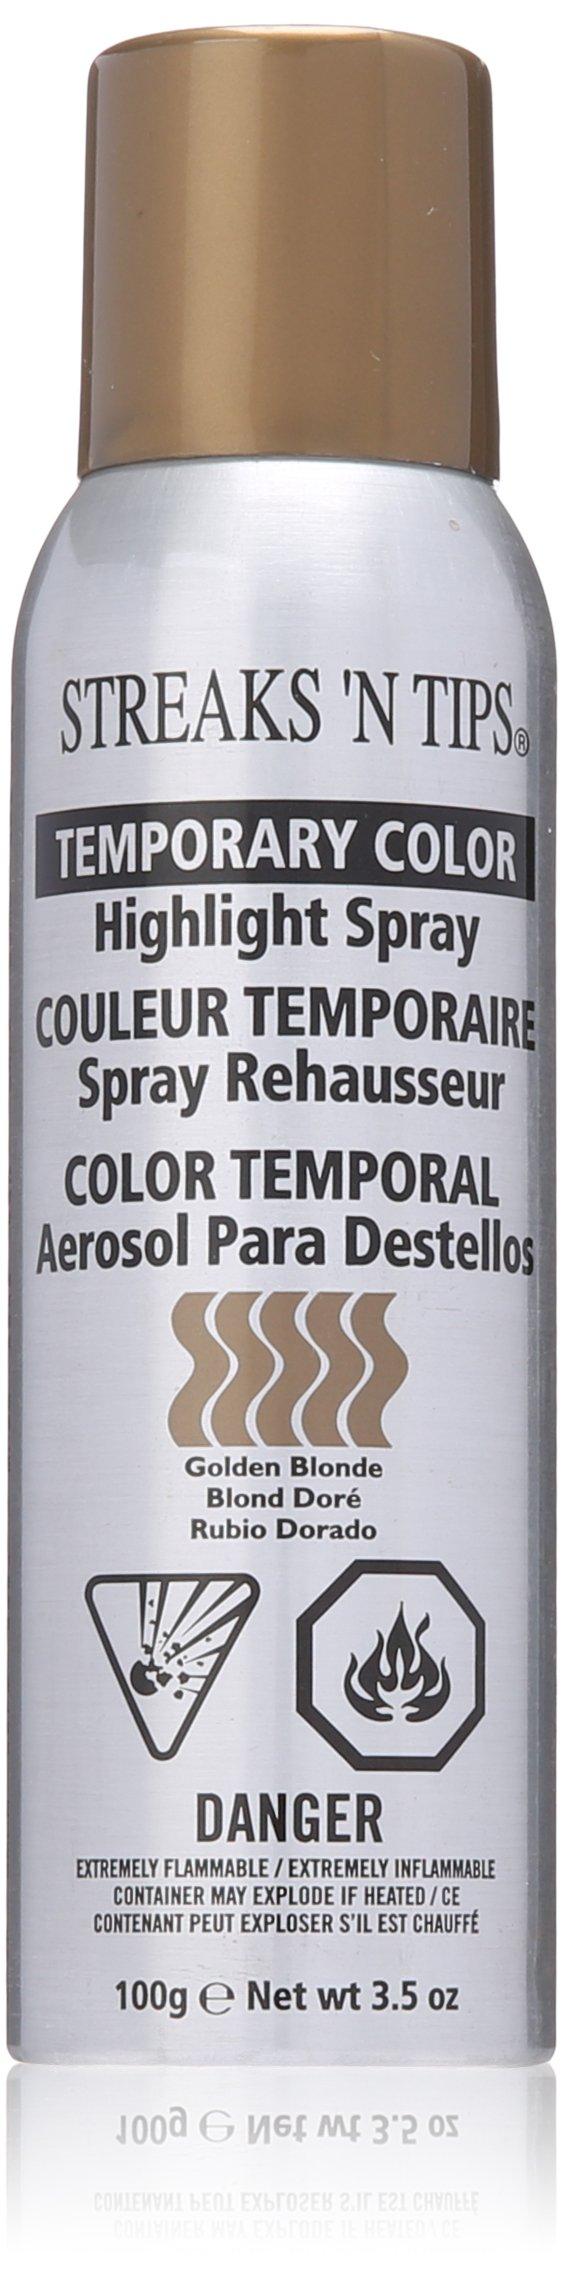 Streaks N Tips Golden Blonde Temporary Spray-on Hair Color, ...